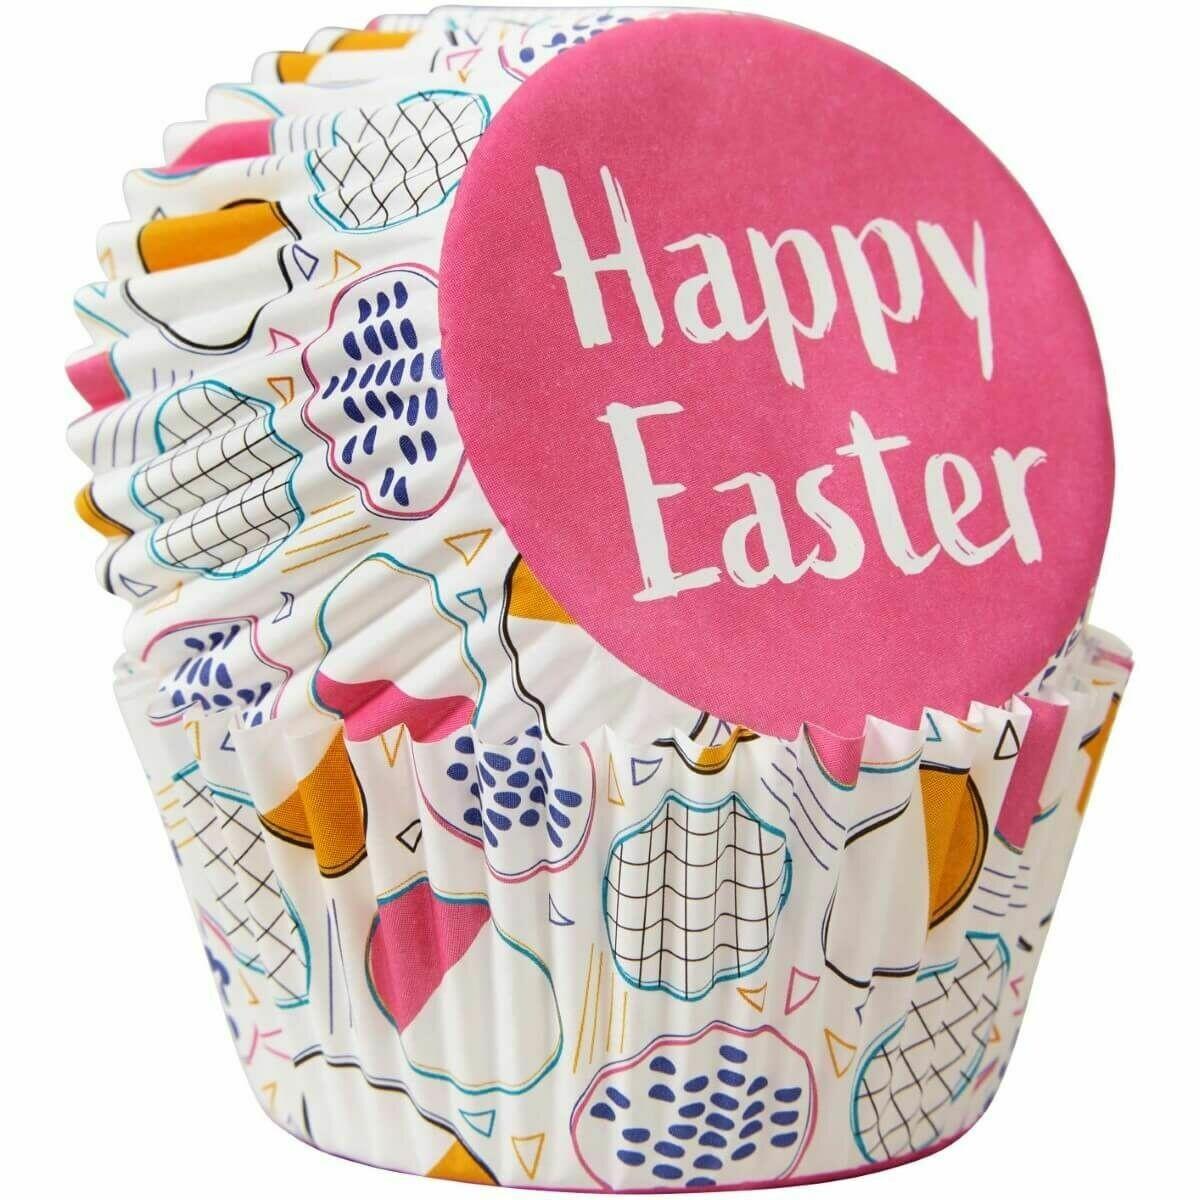 Wilton Easter Cupcake Cases -HIP HOP - Θήκες ψησίματος  με πασχαλινό θέμα 75 τεμ